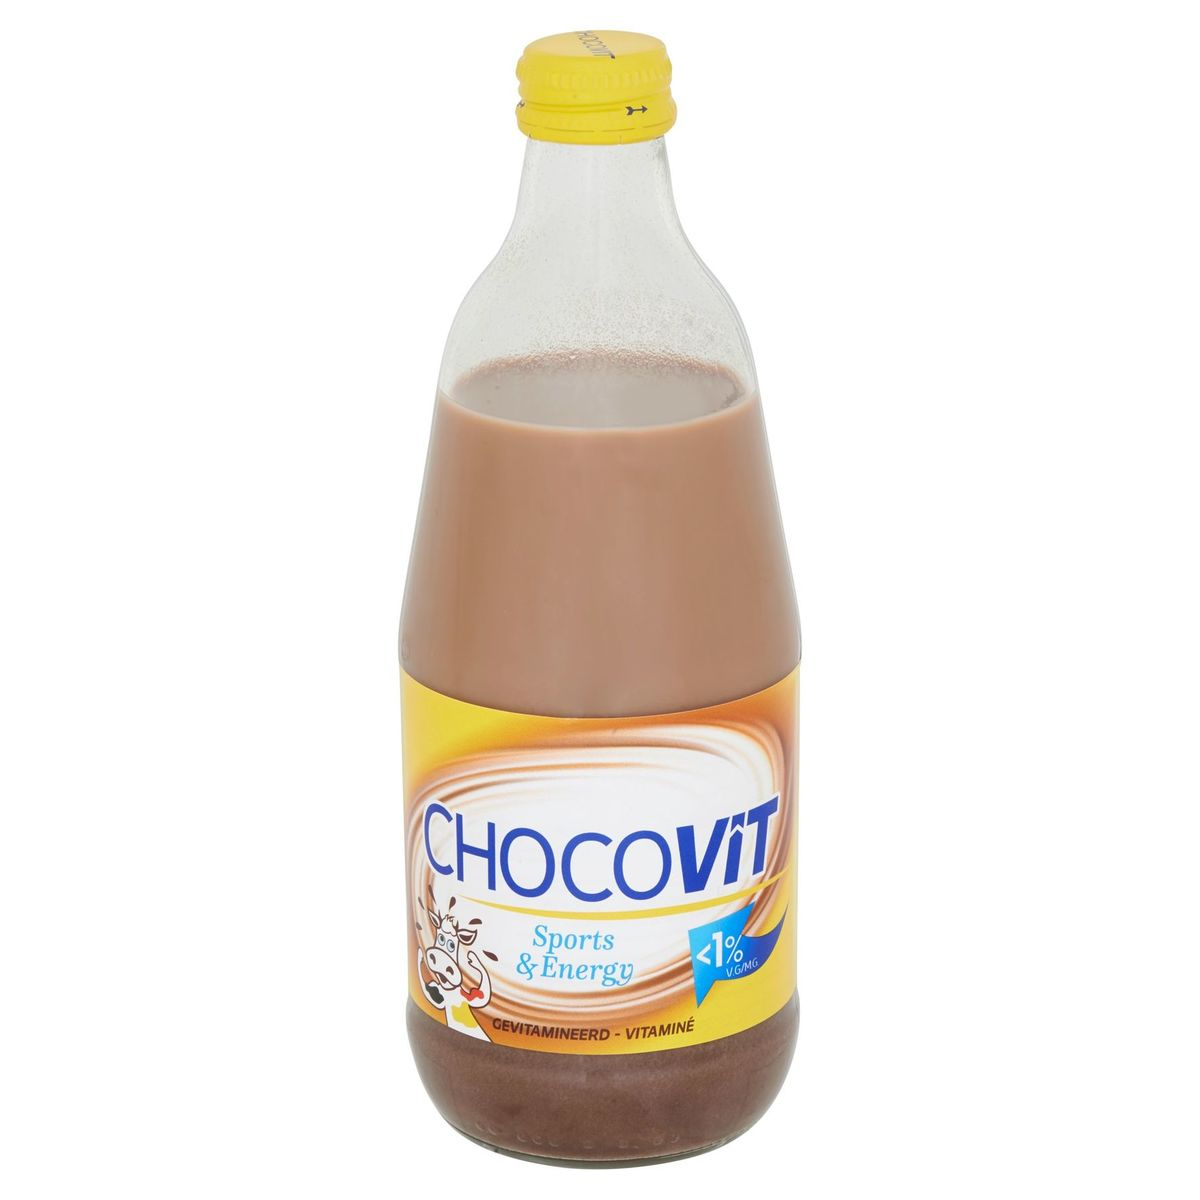 Chocovit Sports & Energy Vitaminé 0.5 L